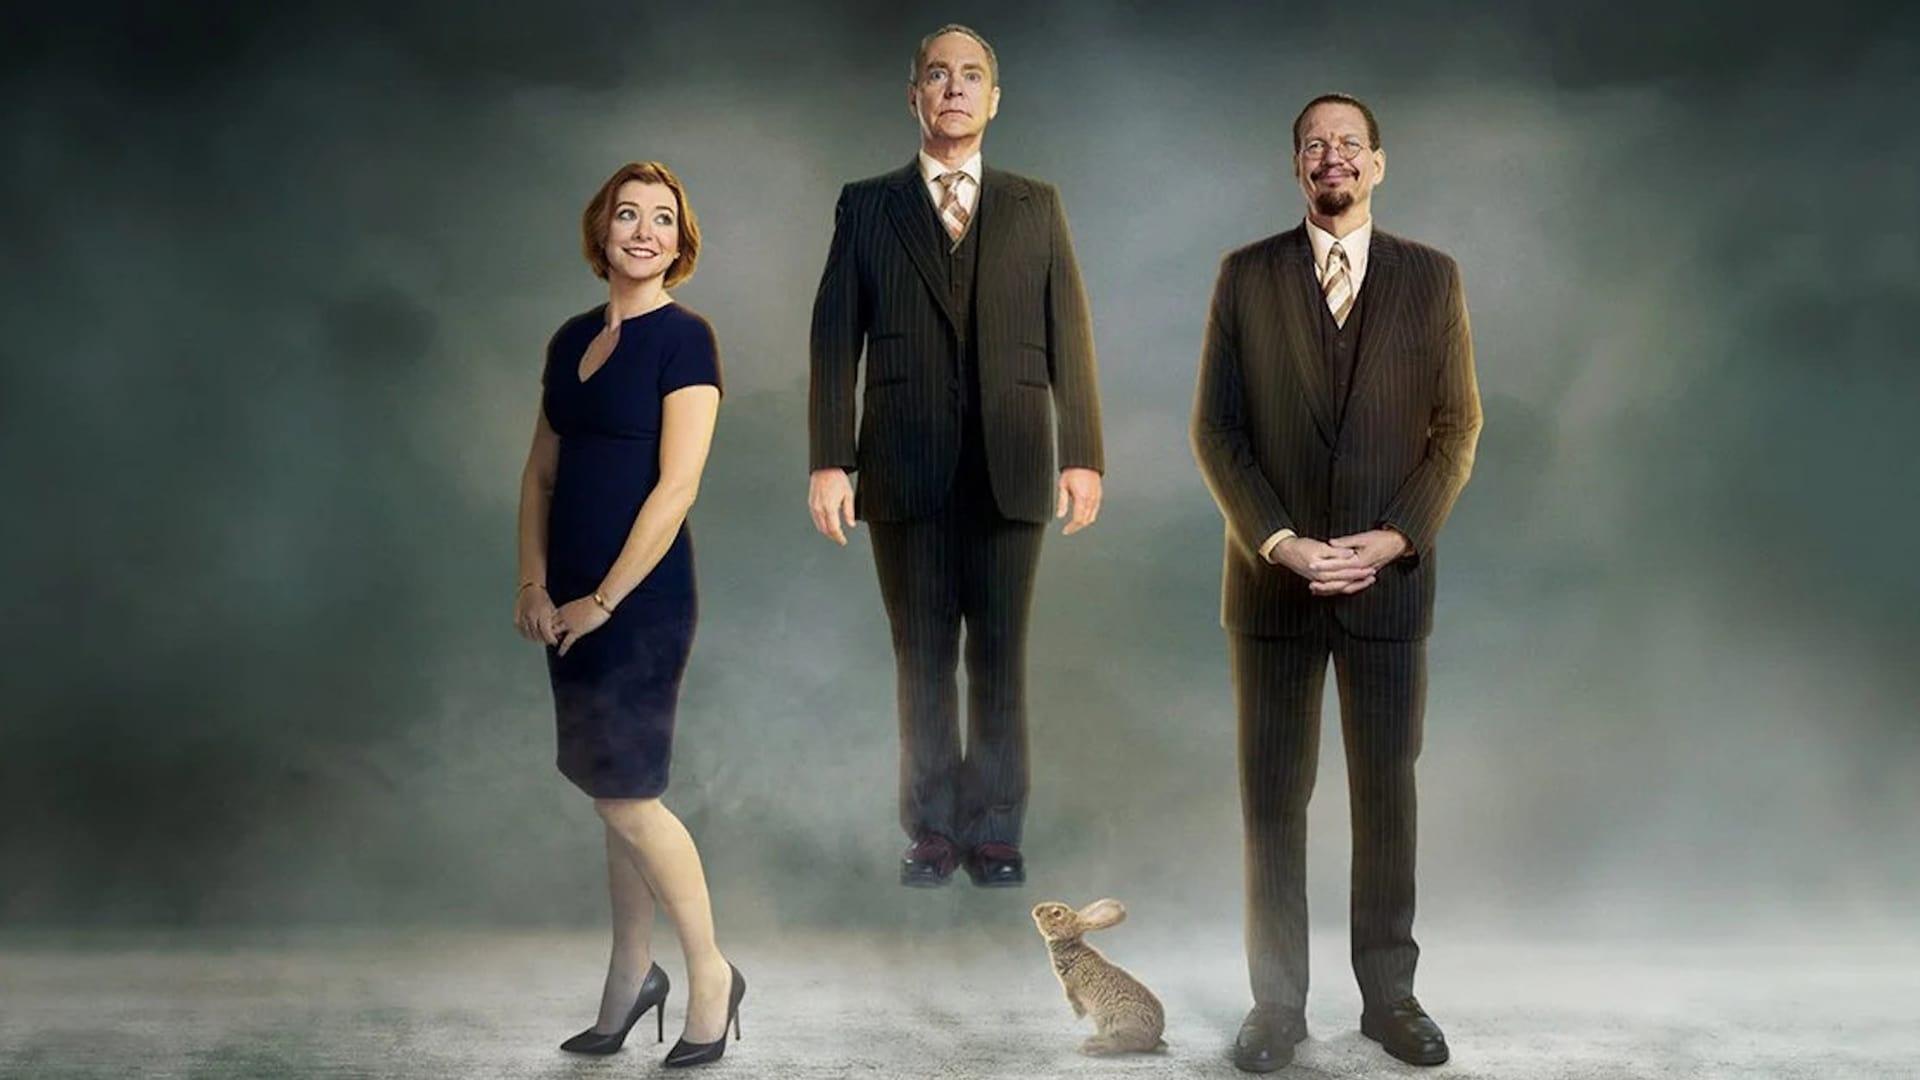 Penn & Teller: Fool Us - Season 7